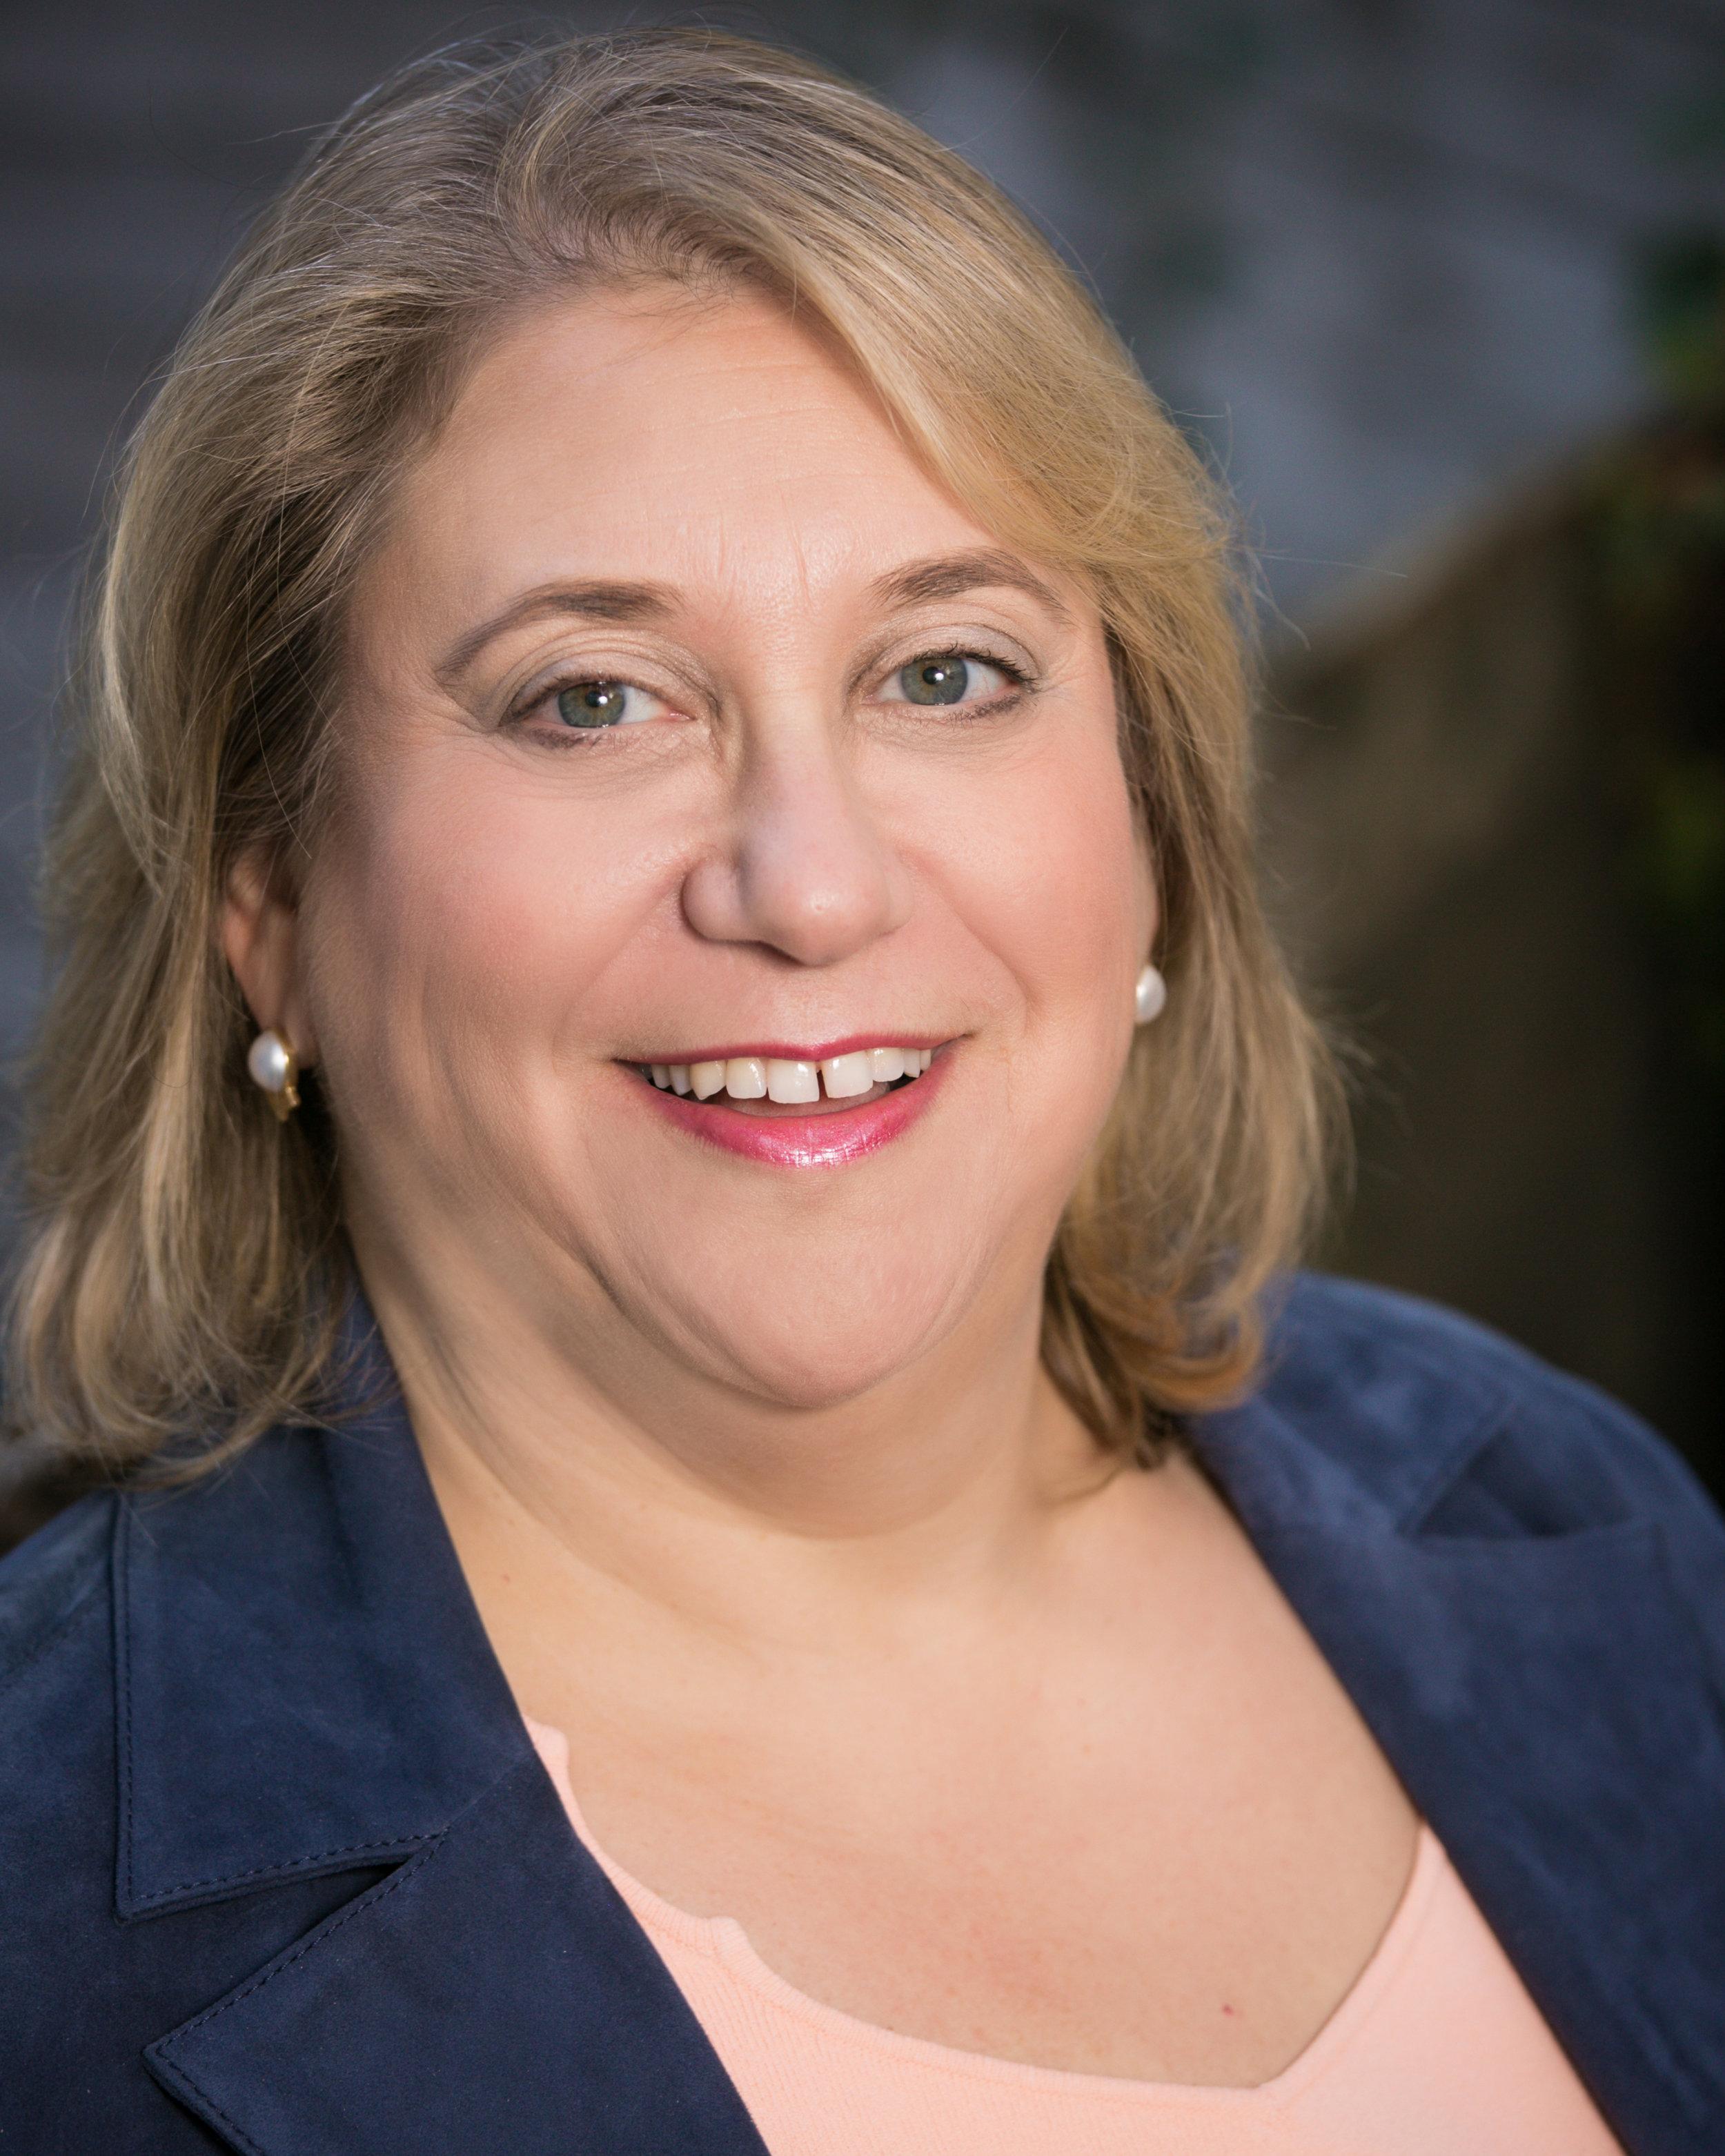 Felicia Lipson